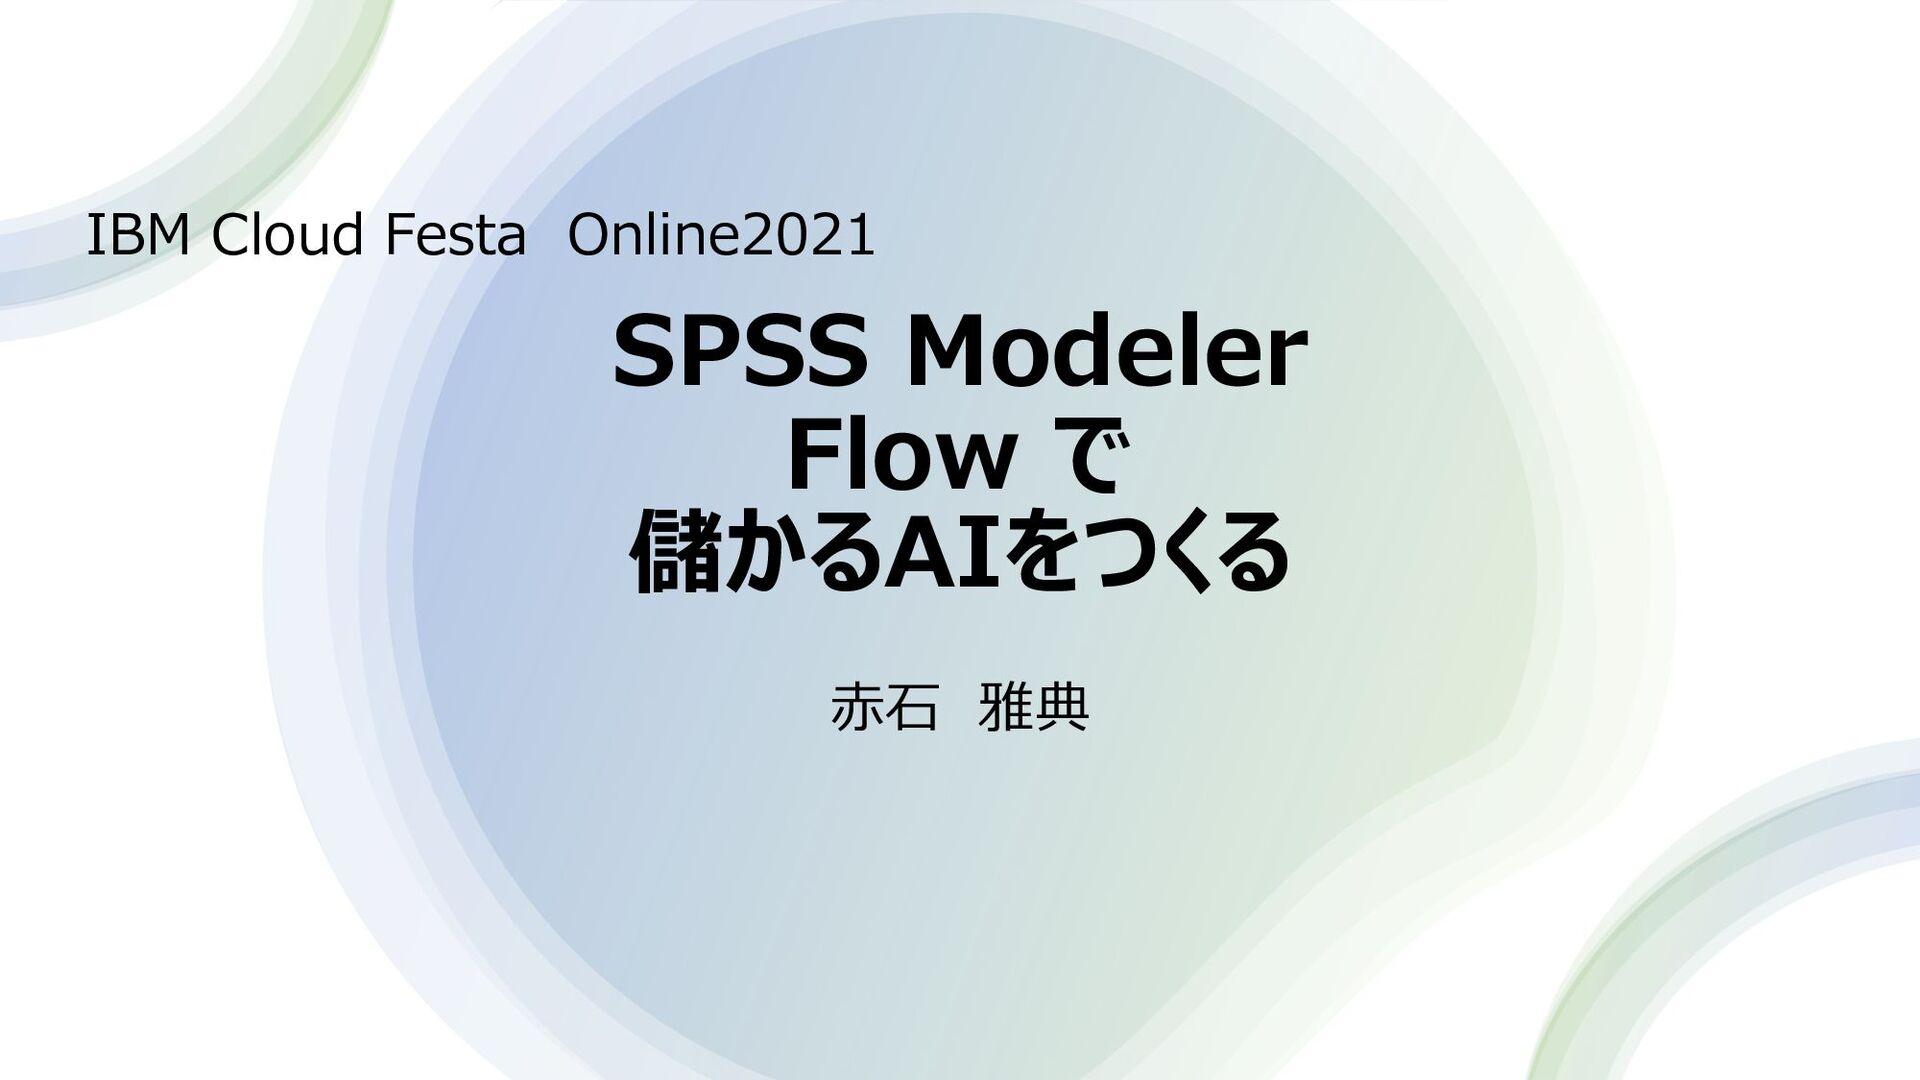 SPSS Modeler Flow で 儲かるAIをつくる IBM Cloud Festa O...